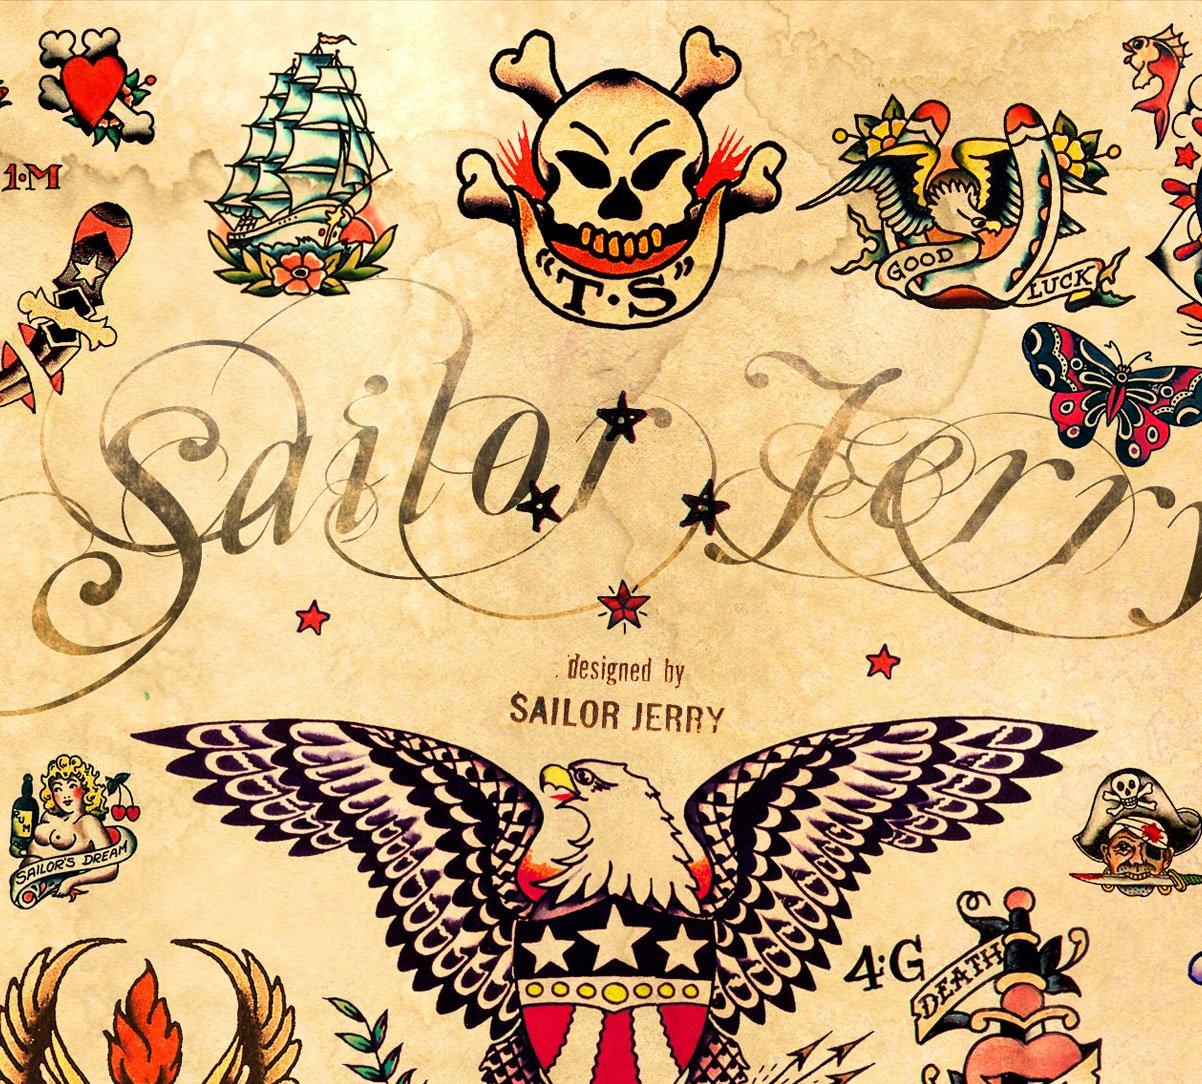 Amazon.com: 3 - Sailor Jerry Tattoo Flash Posters 12\